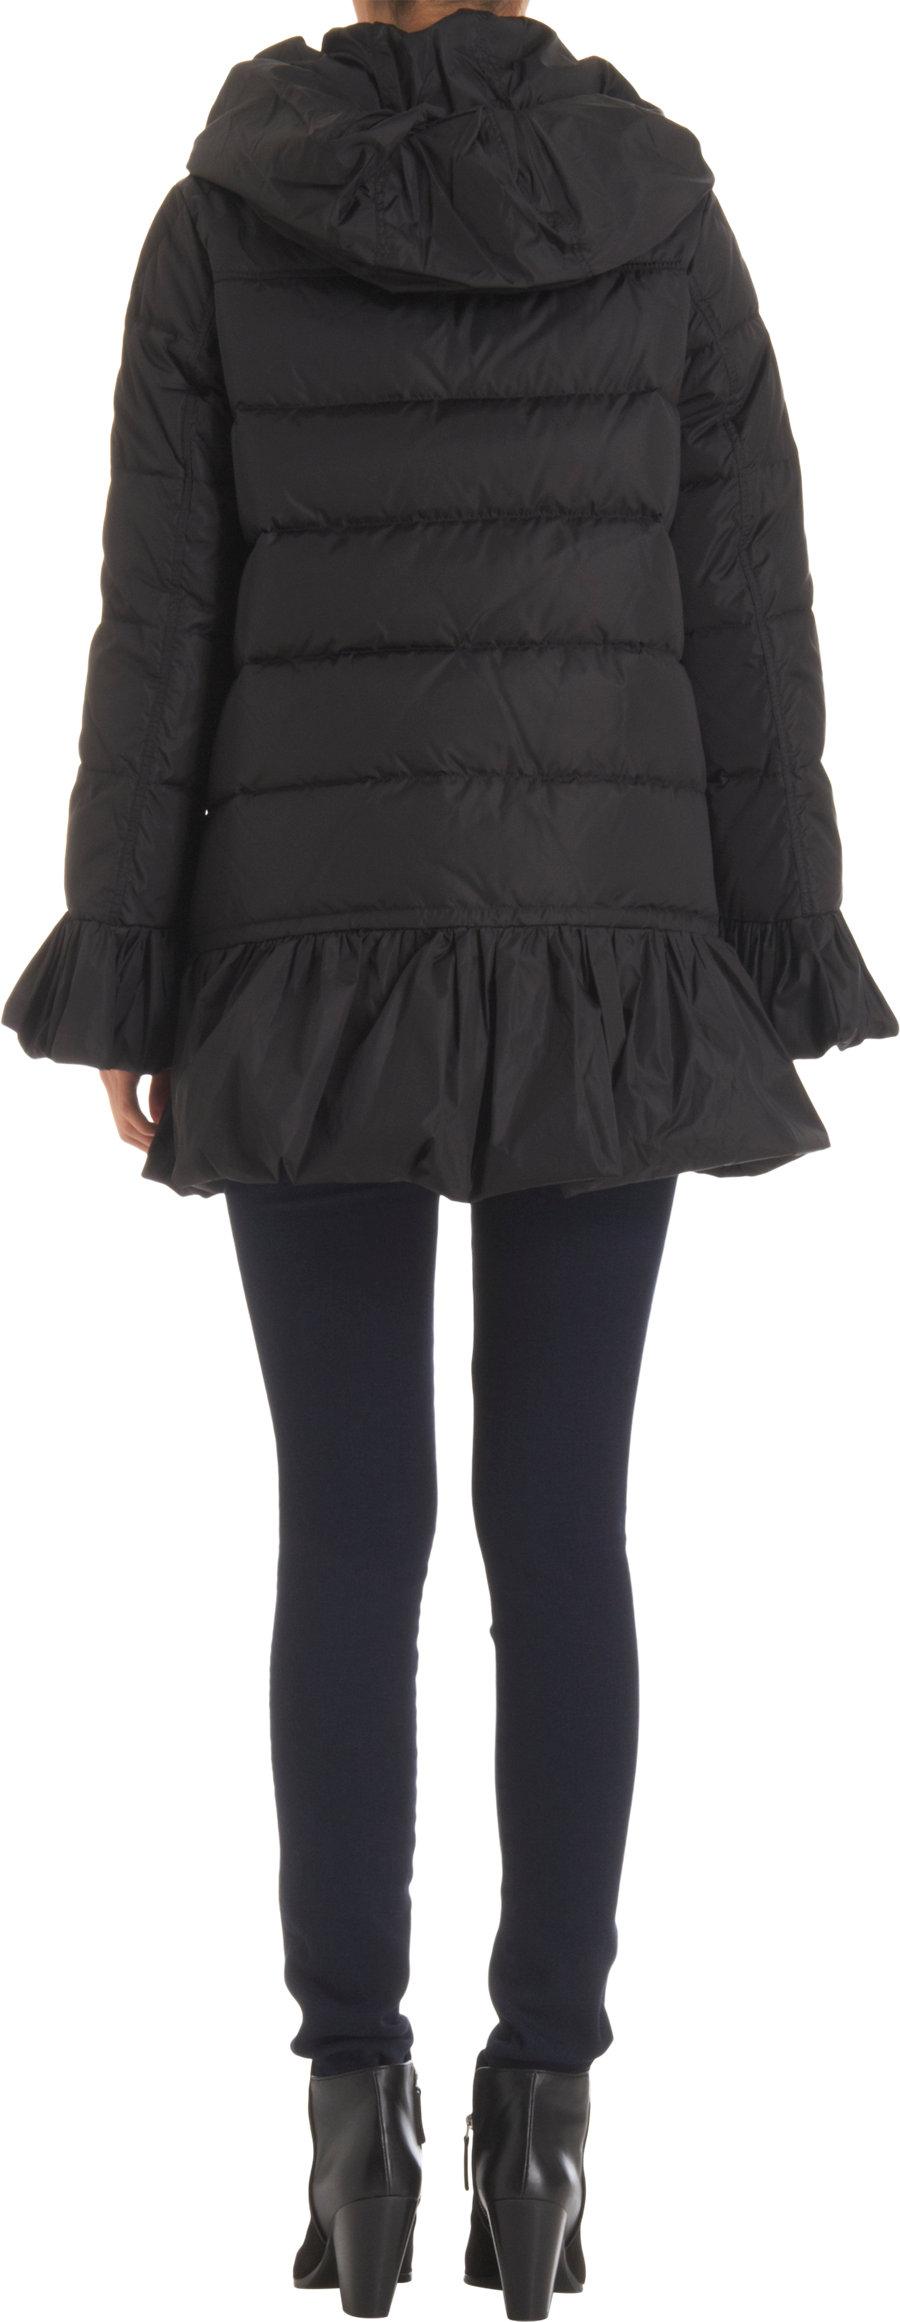 switzerland moncler coat ruffle 8cf4e bce30